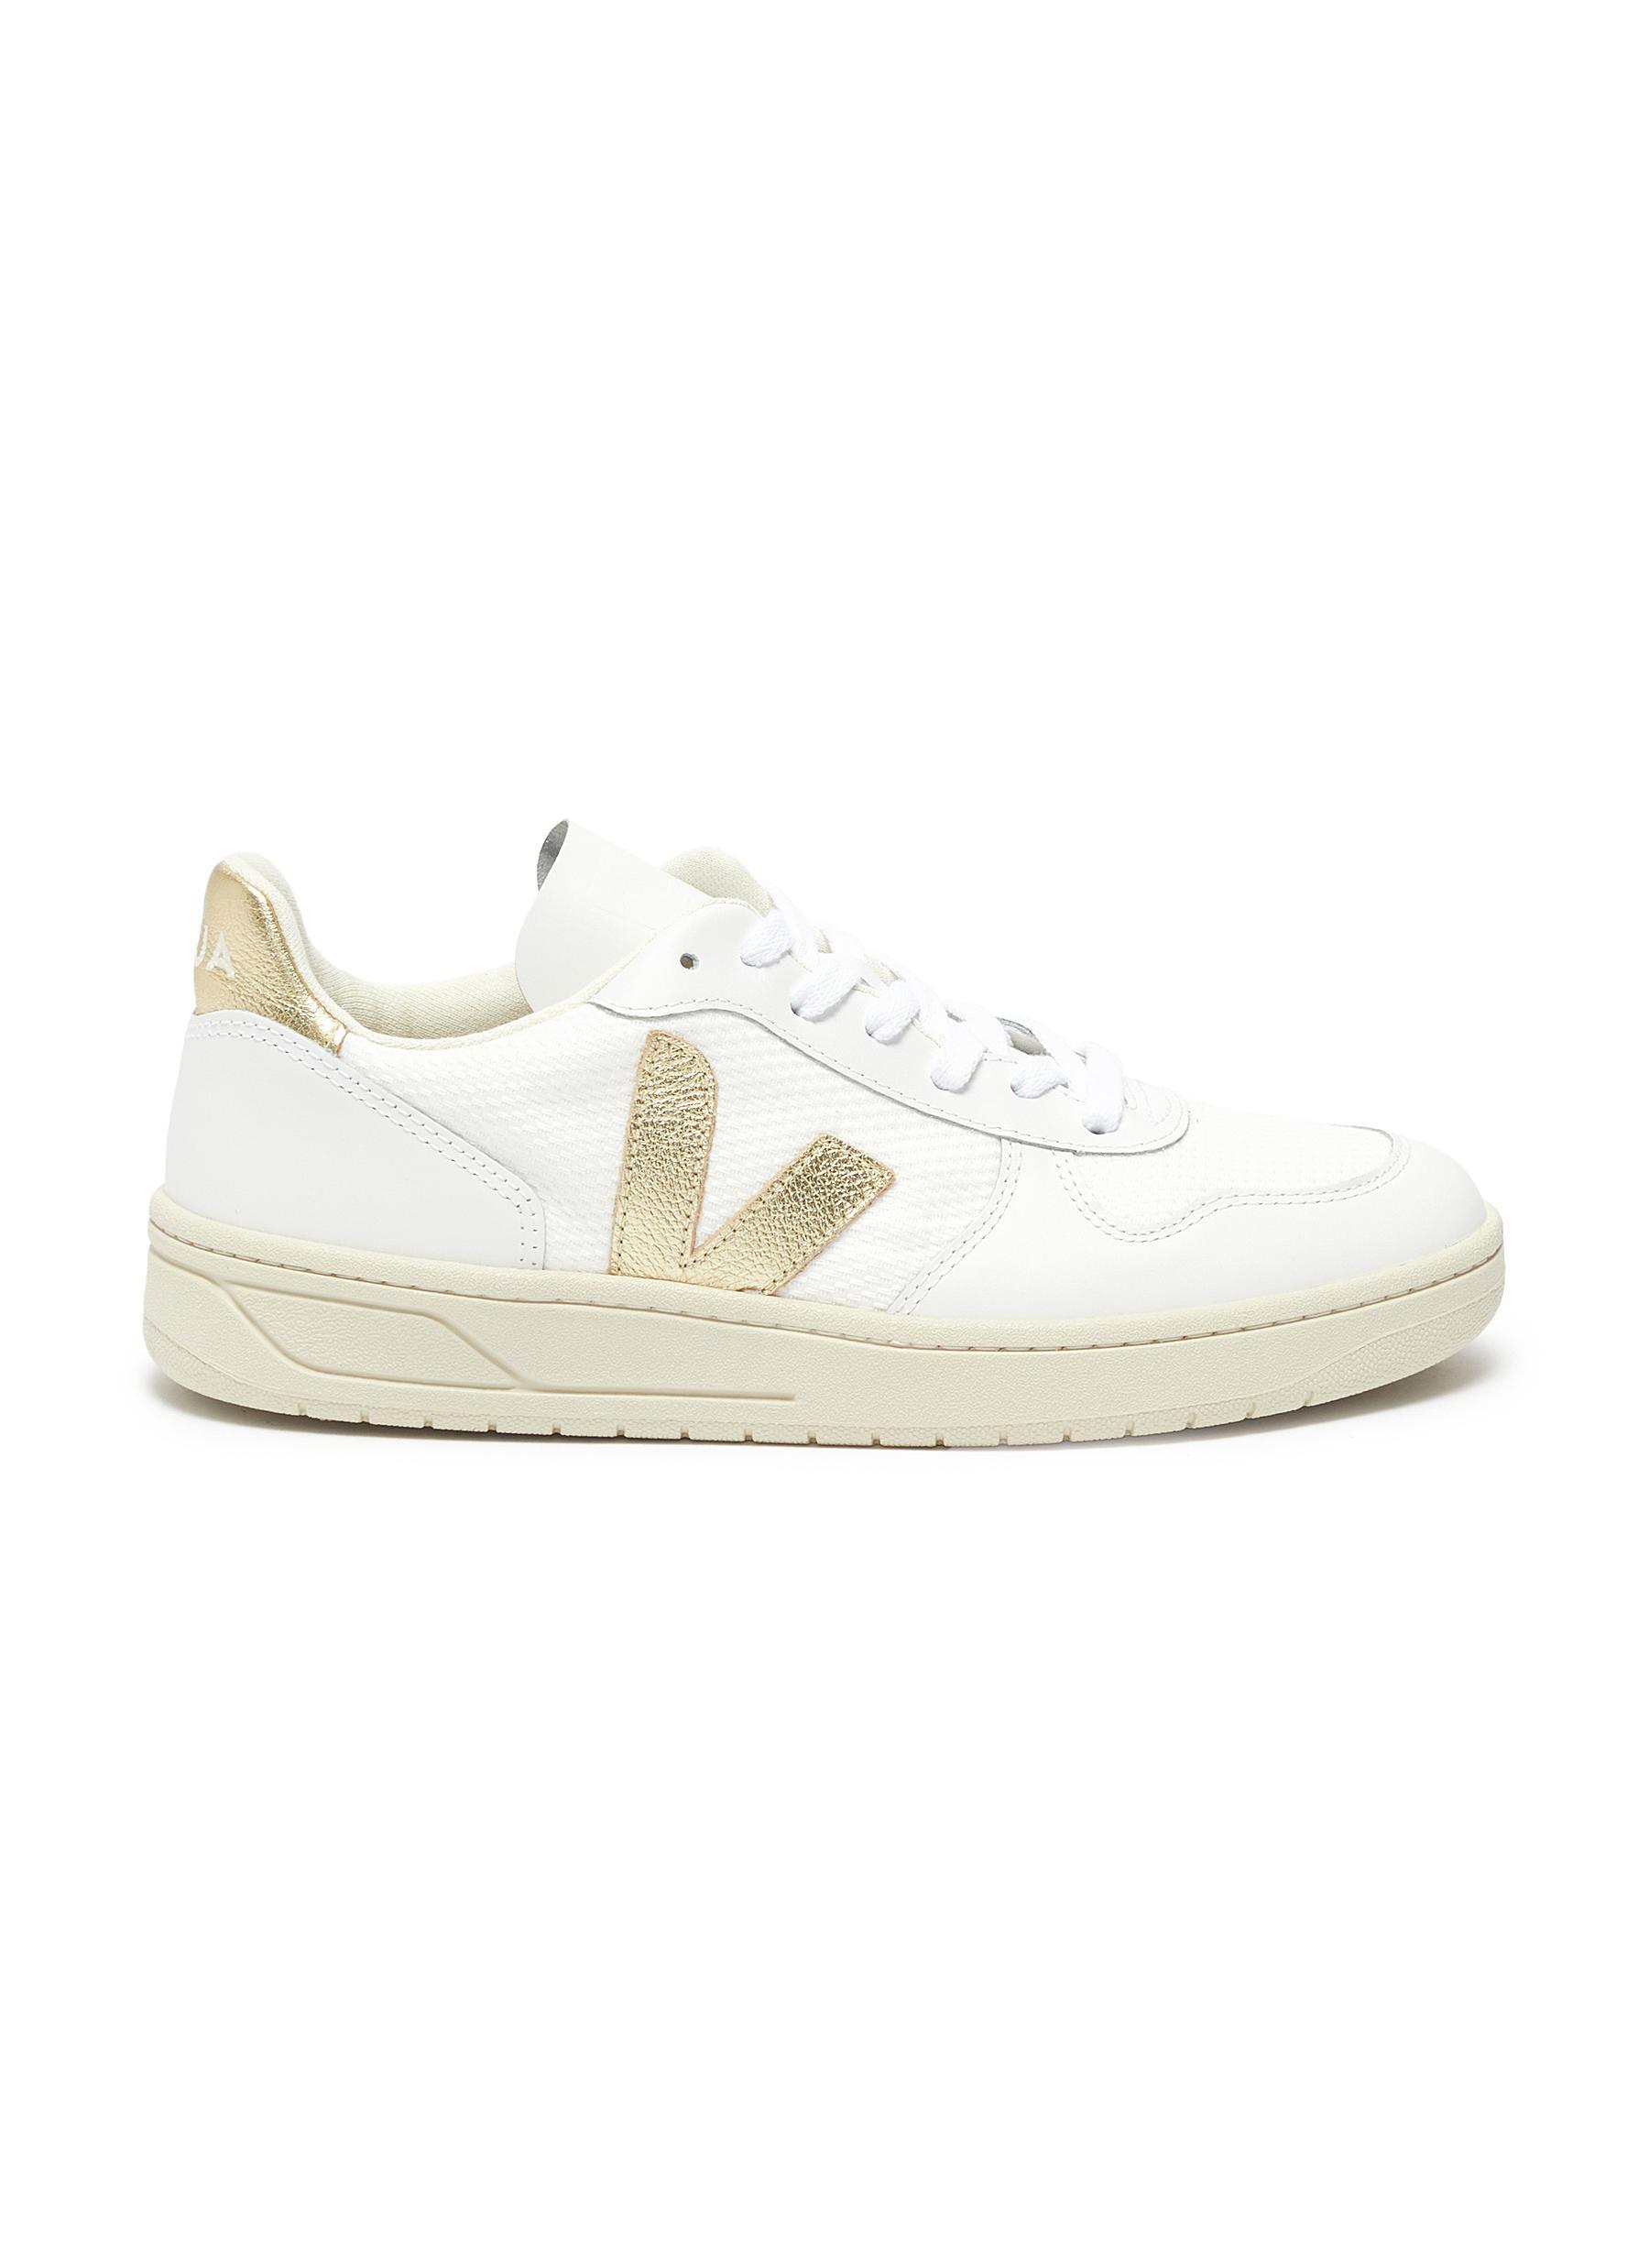 Veja Sneakers V-10 B-mesh leather sneakers